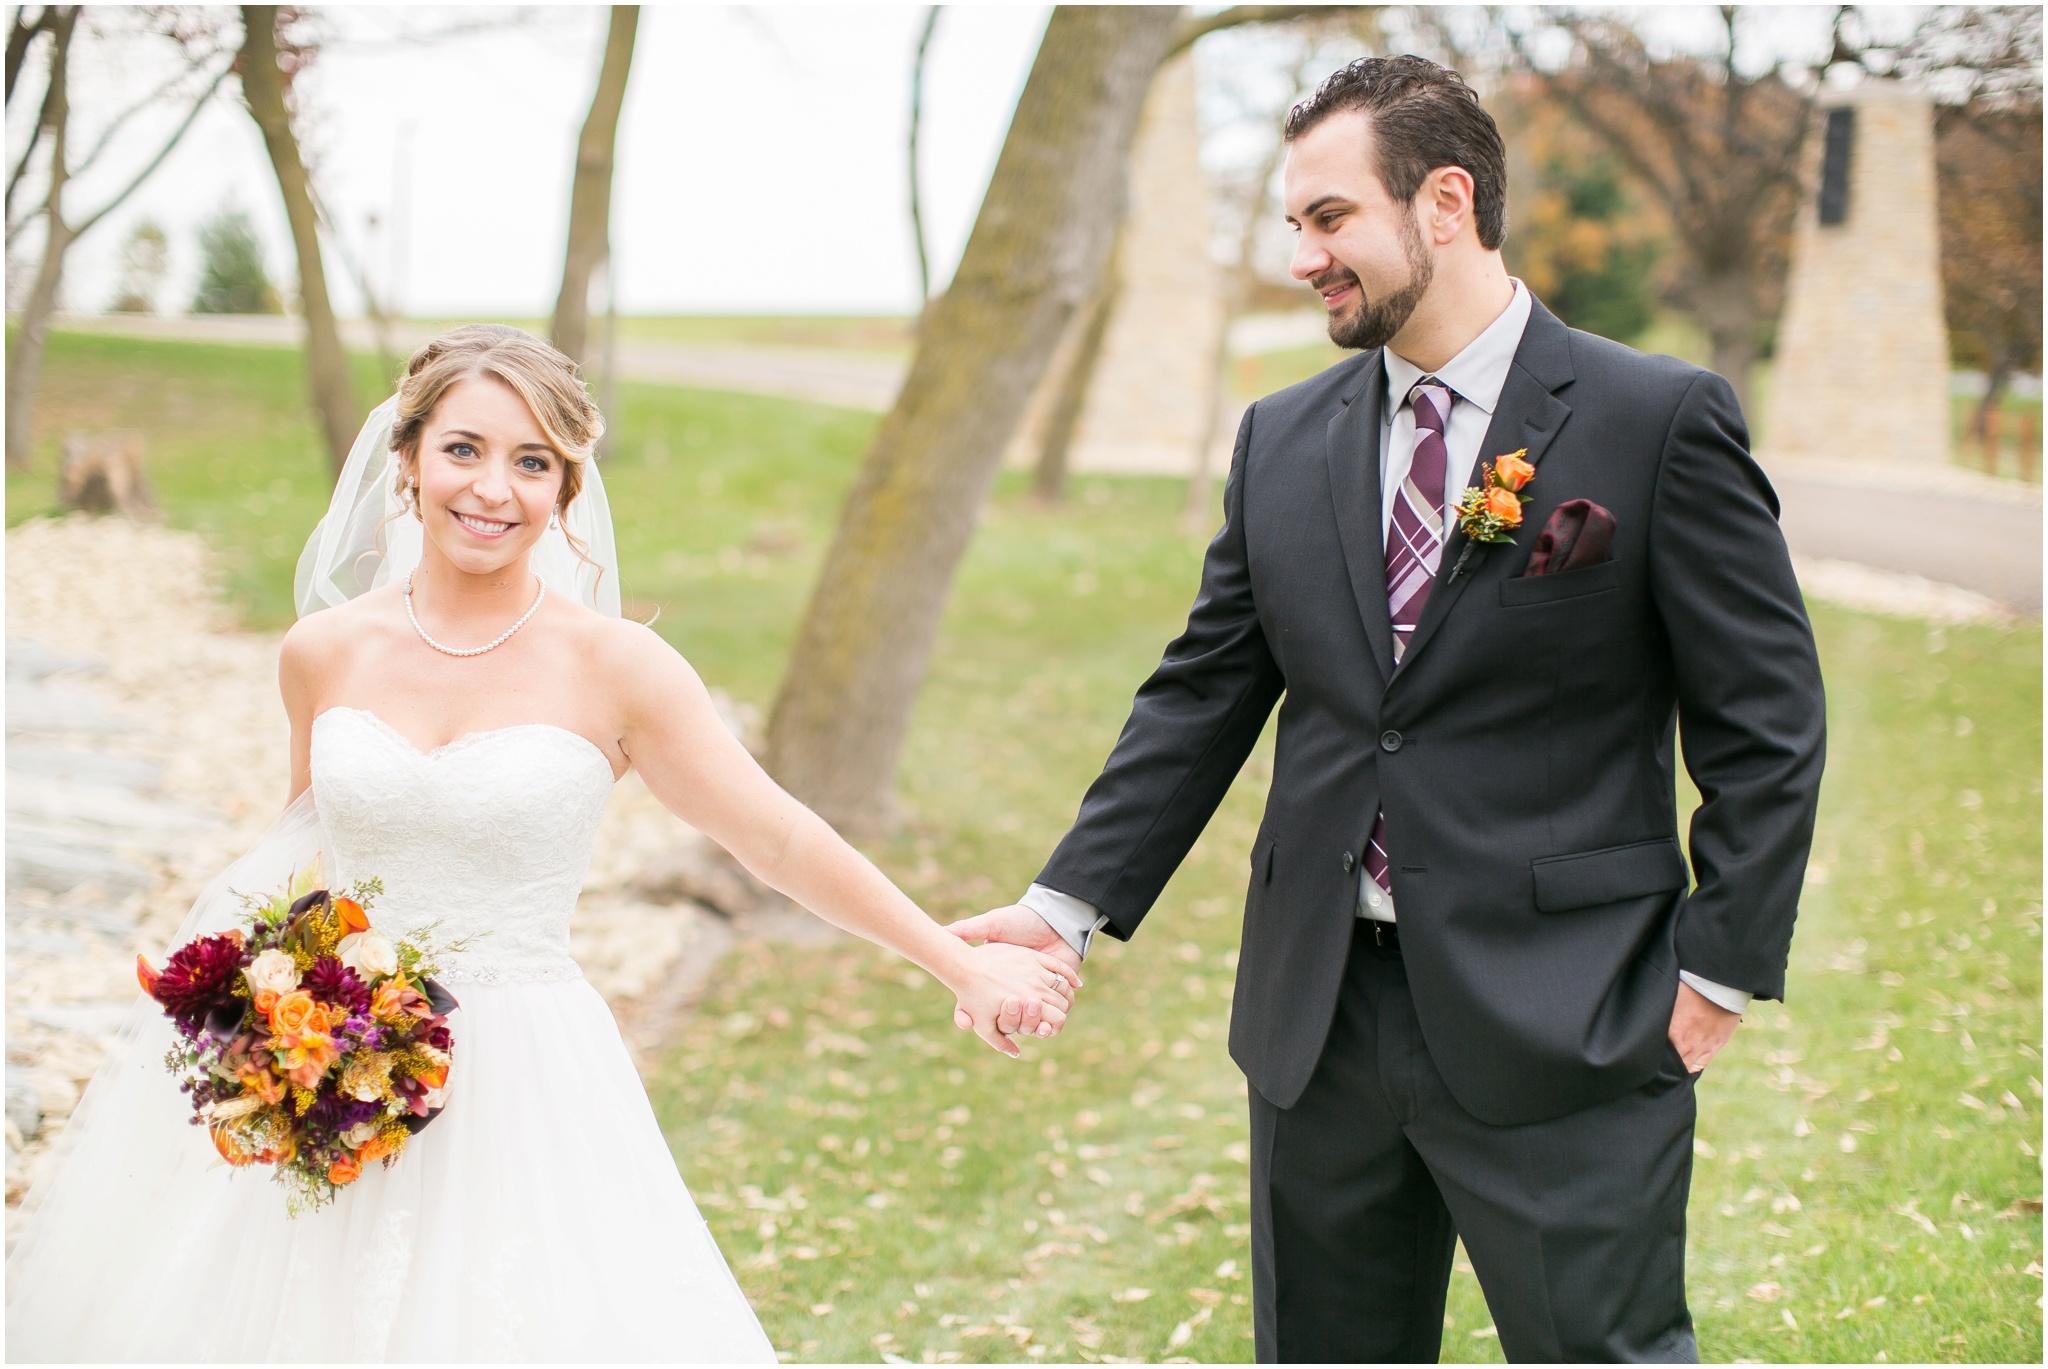 DC_Estate_Winery_Wedding_Beloit_Illinois_Wedding_0043.jpg